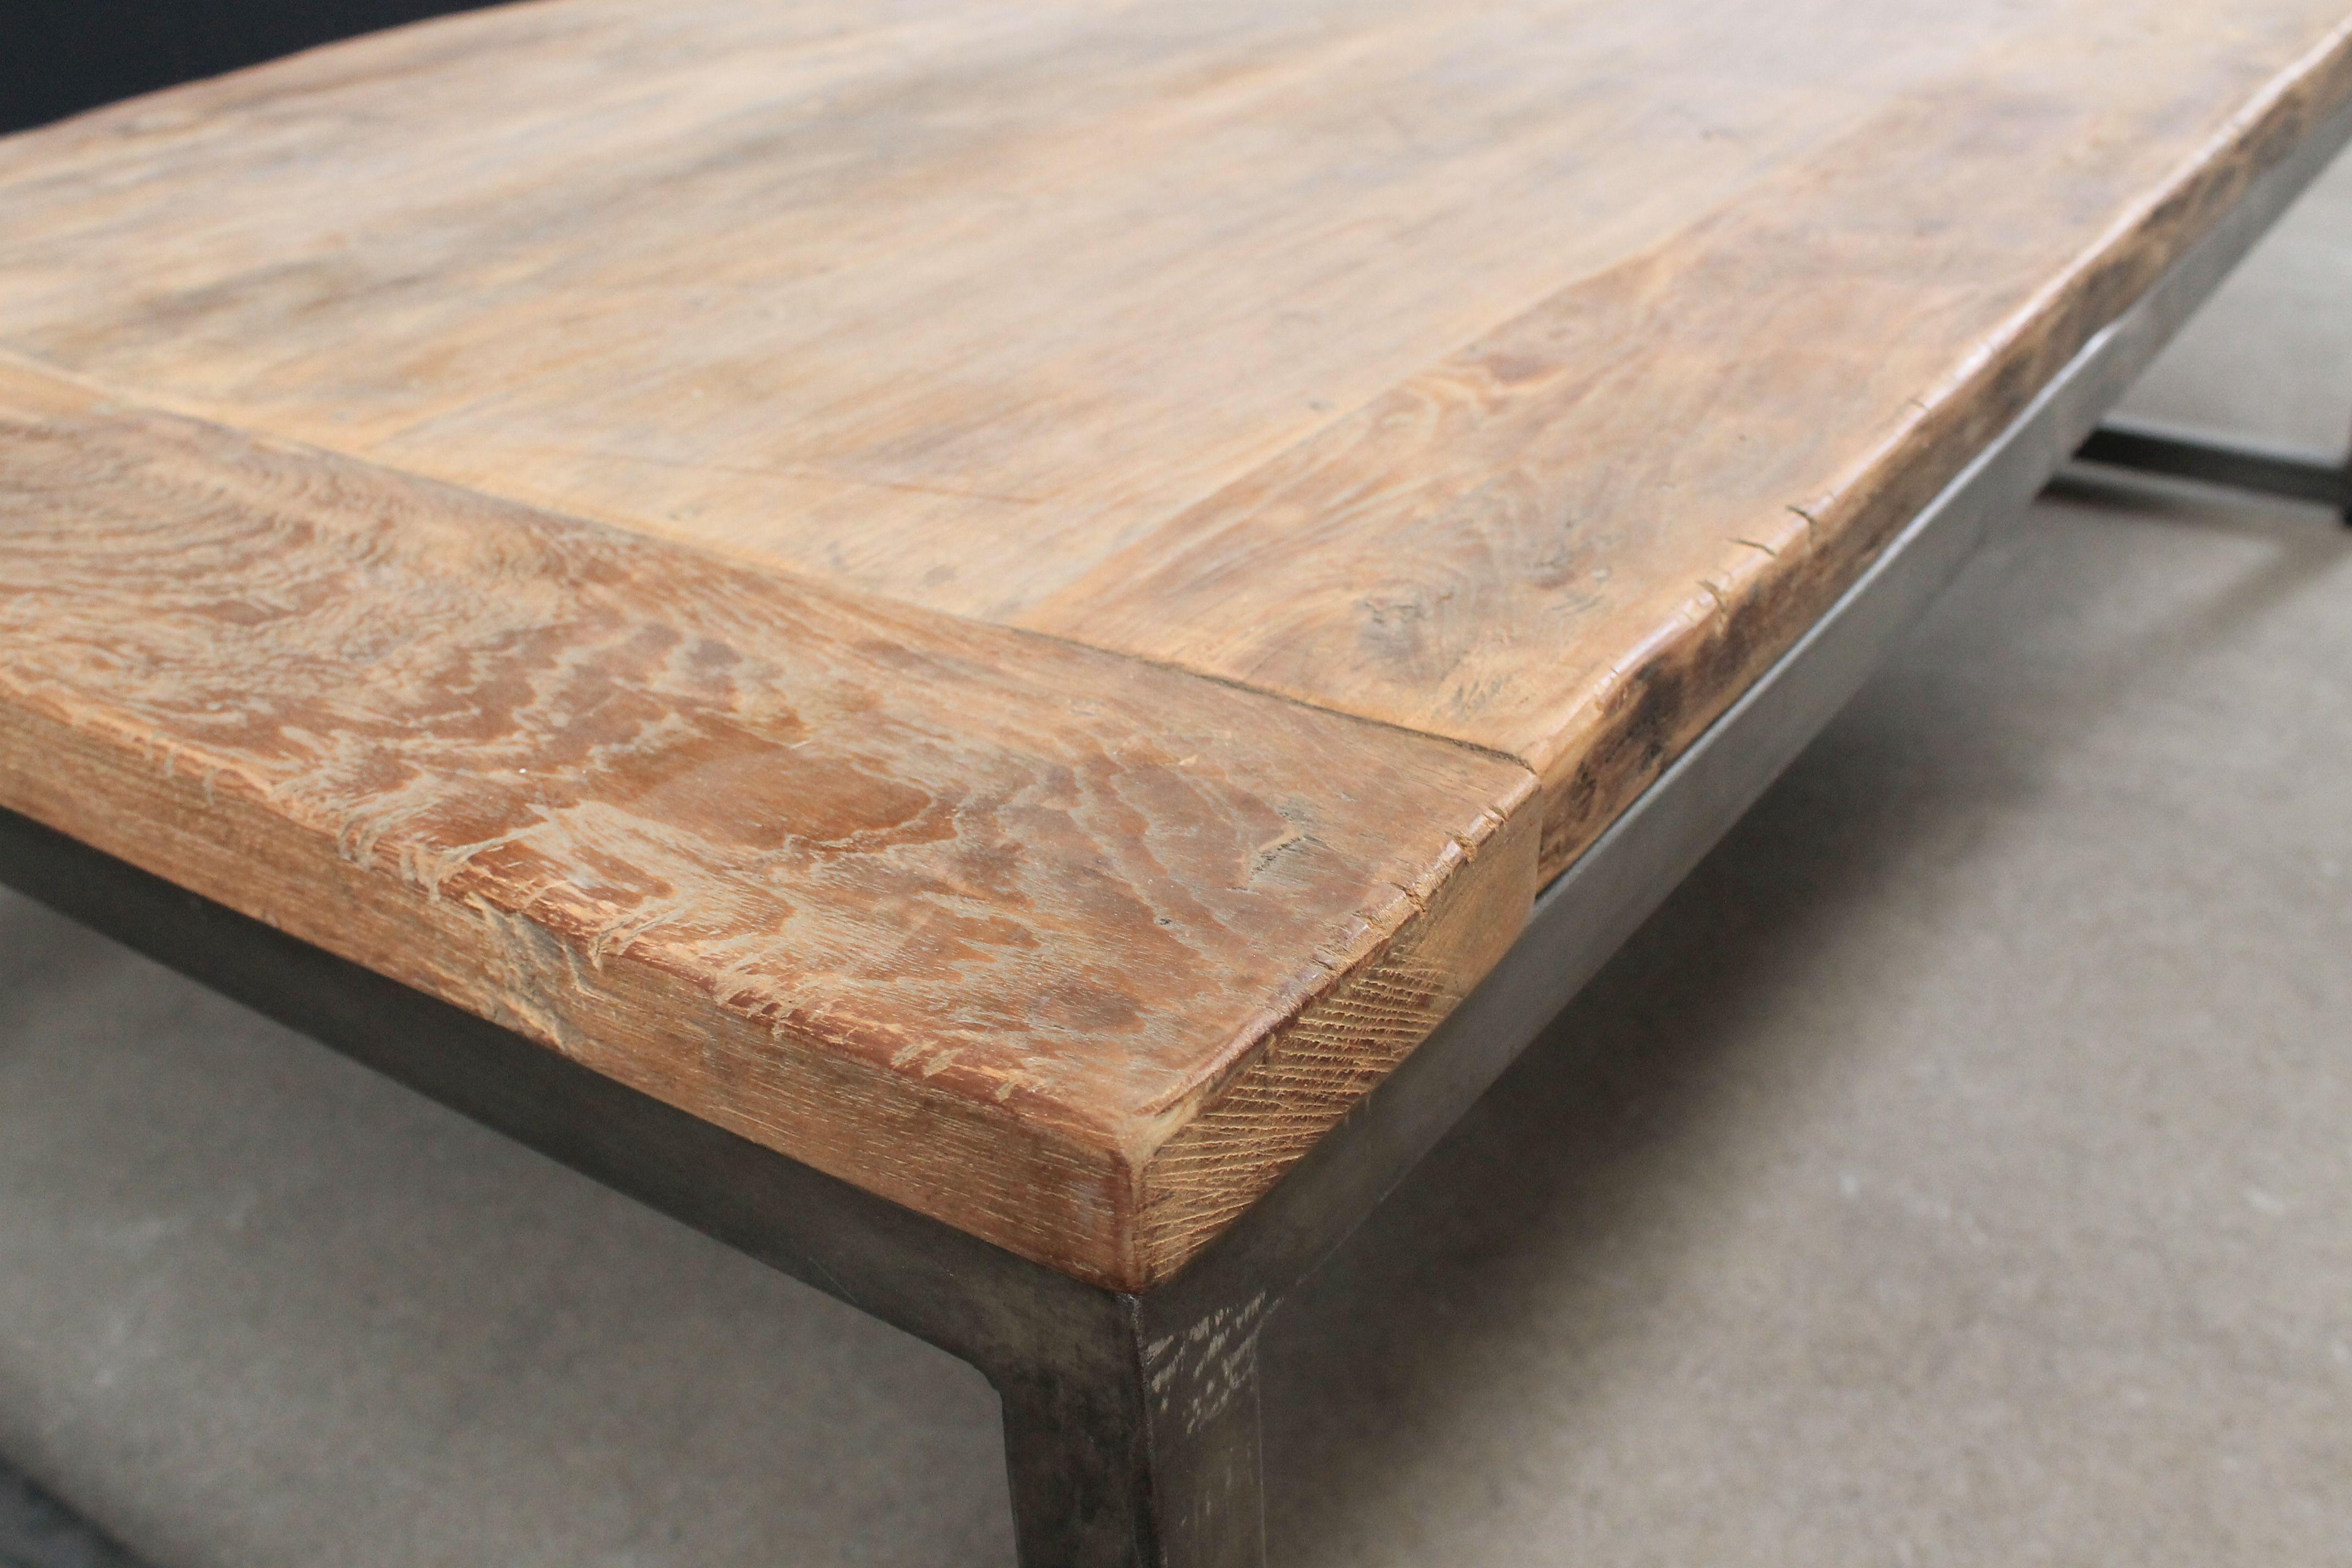 Teak Houten Tafel Bladen.Oud Teak Hout Houten Tafelbladen Home Decor Furniture En Home